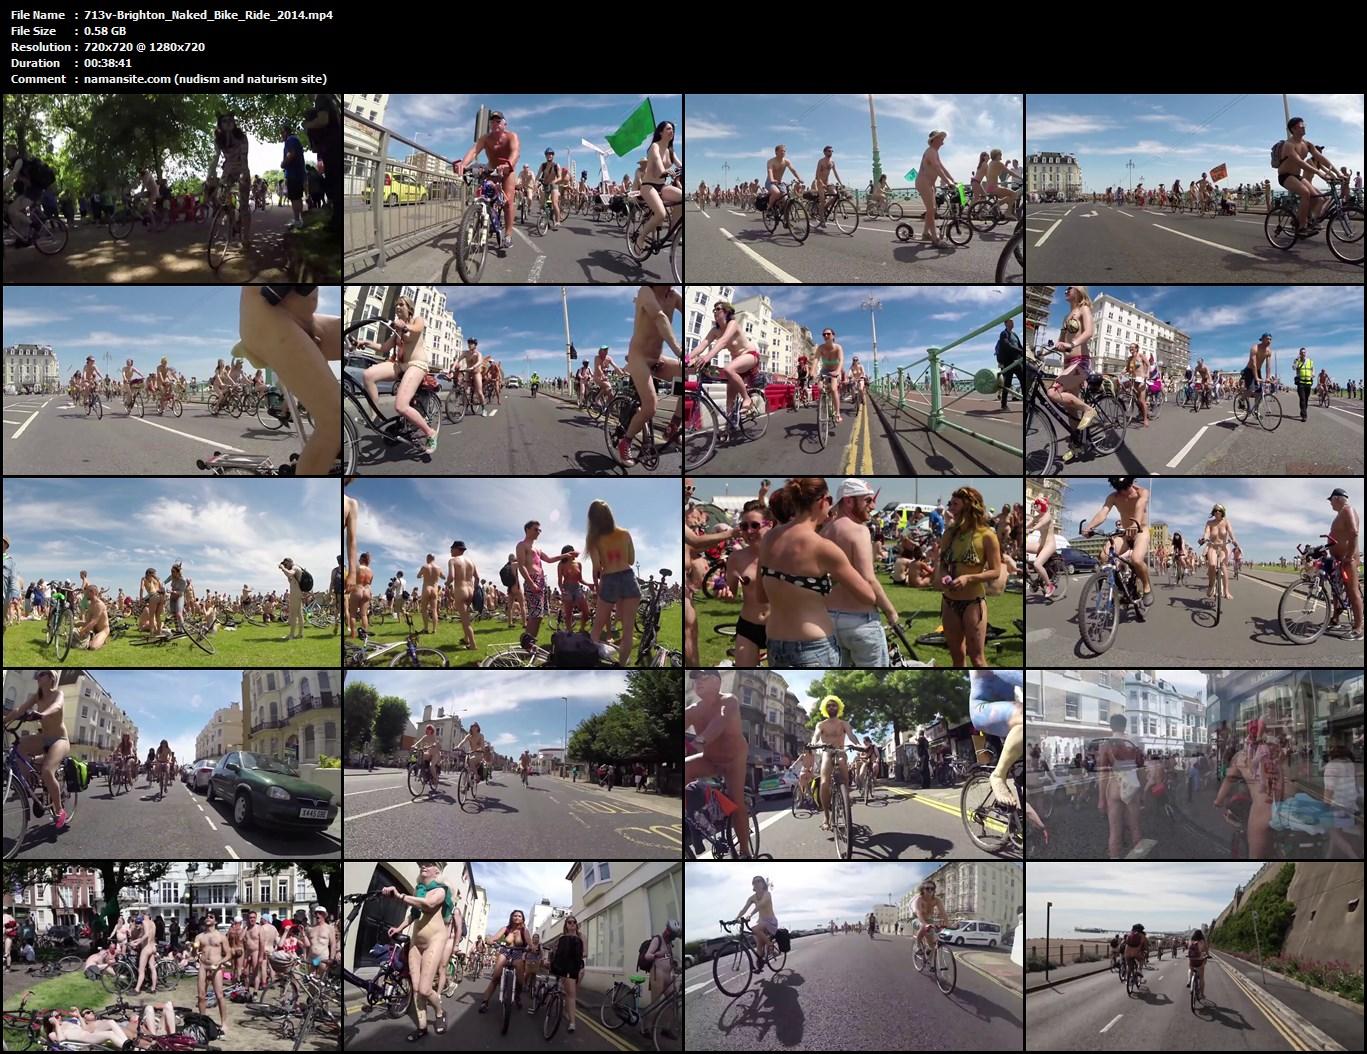 brighton nudist bike ride 2015